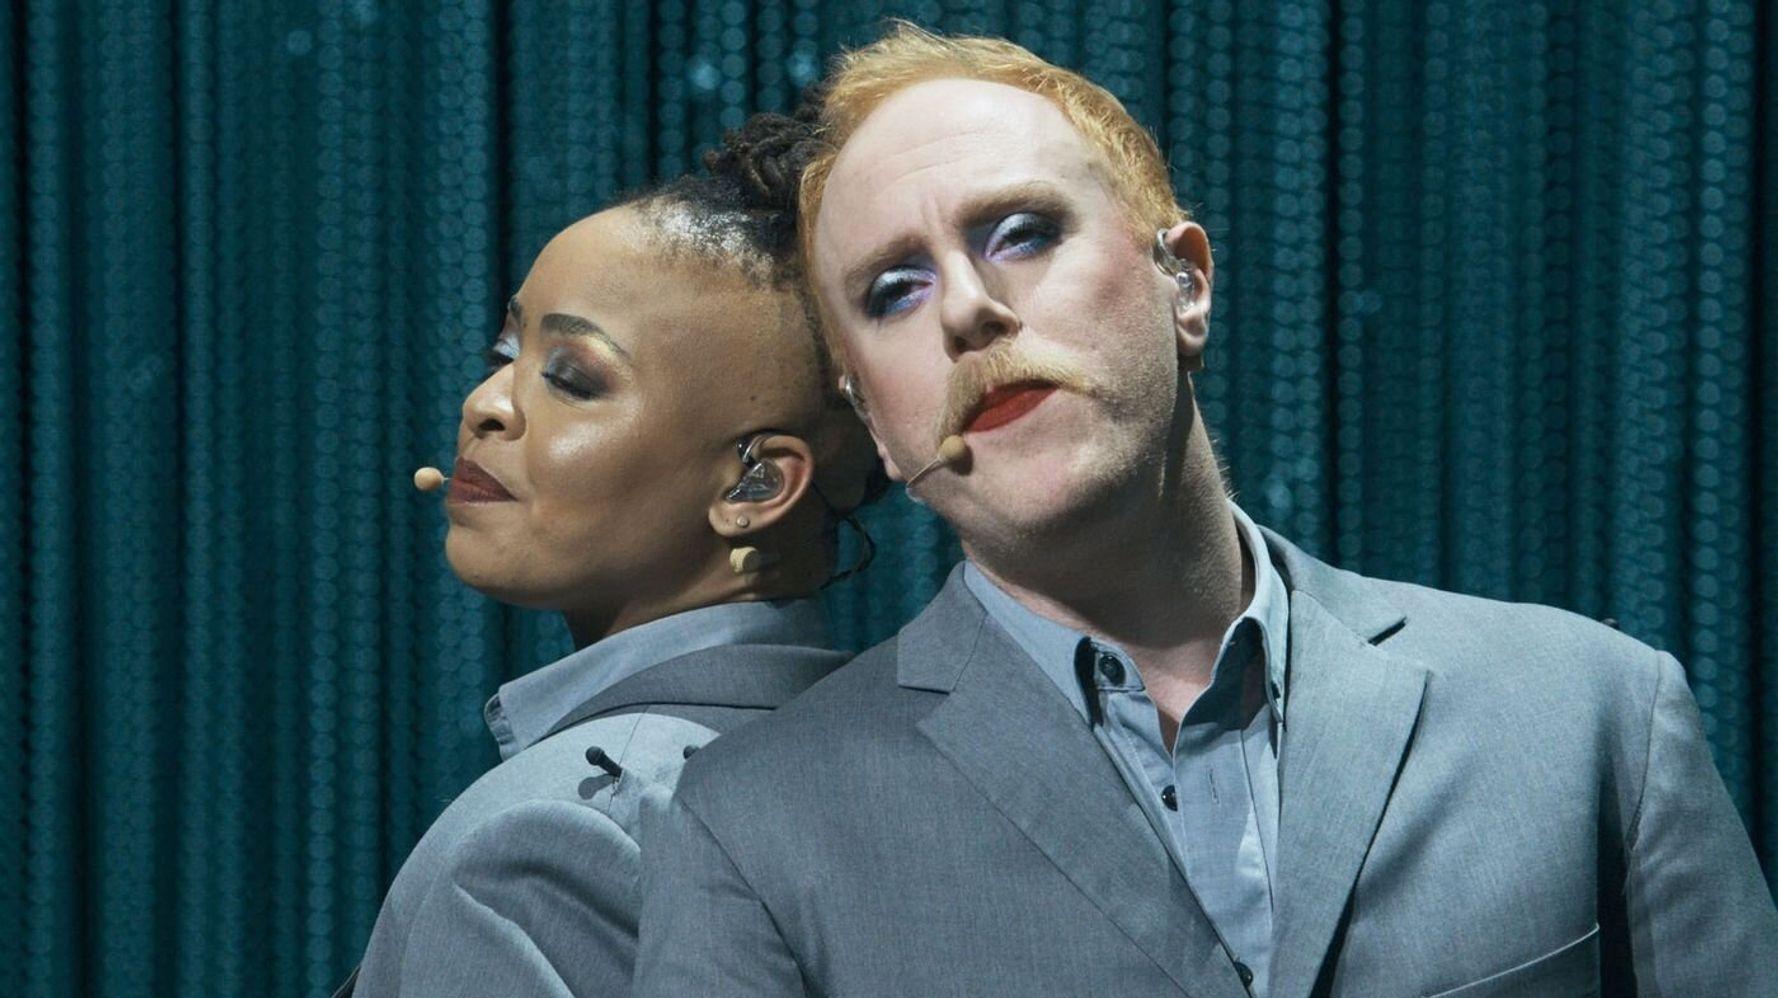 David Byrne's Scene-Stealing Dancers Break Down The Making Of 'American Utopia'